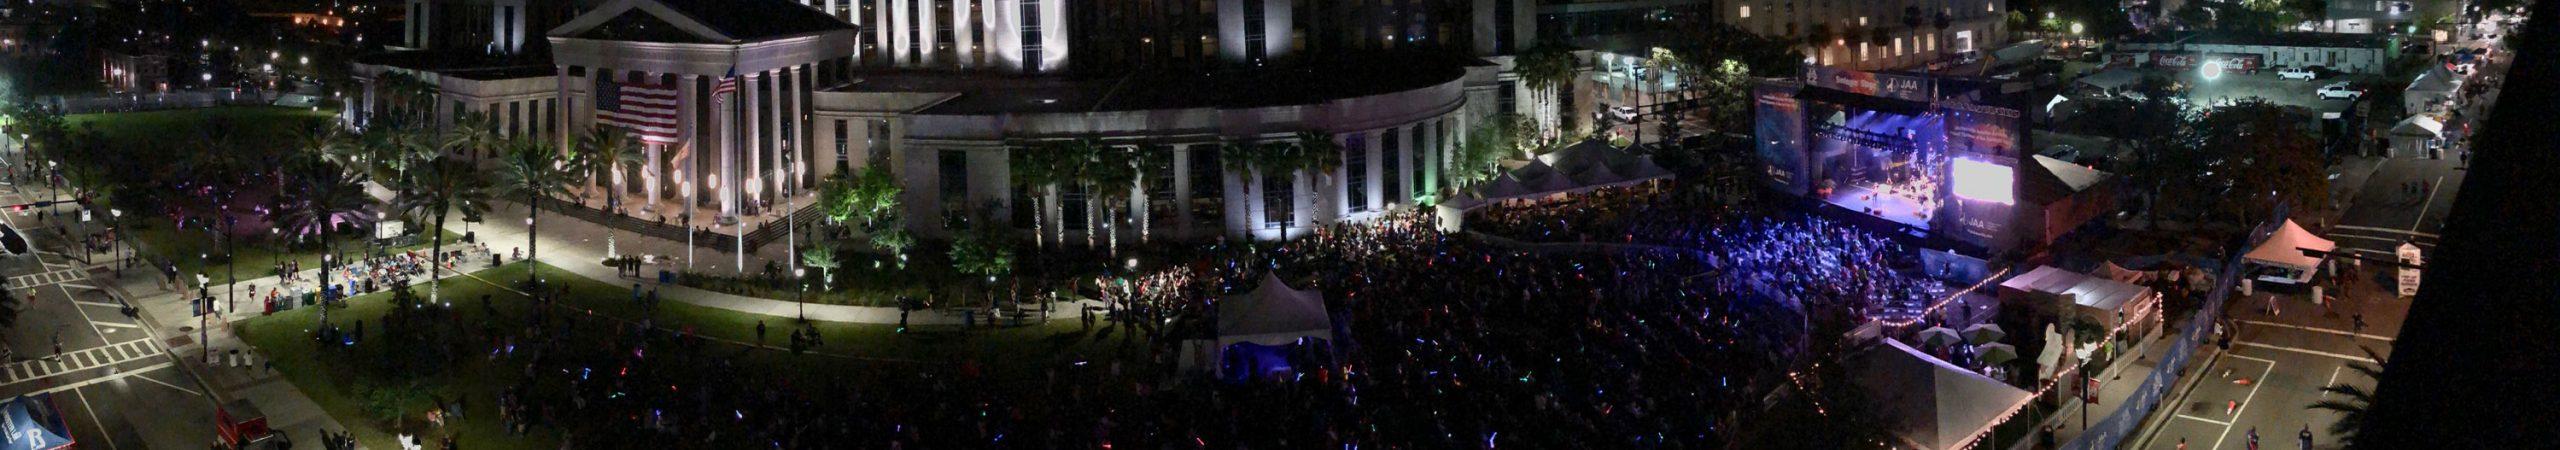 Jacksonville Jazz Festival 2018 – Sunday